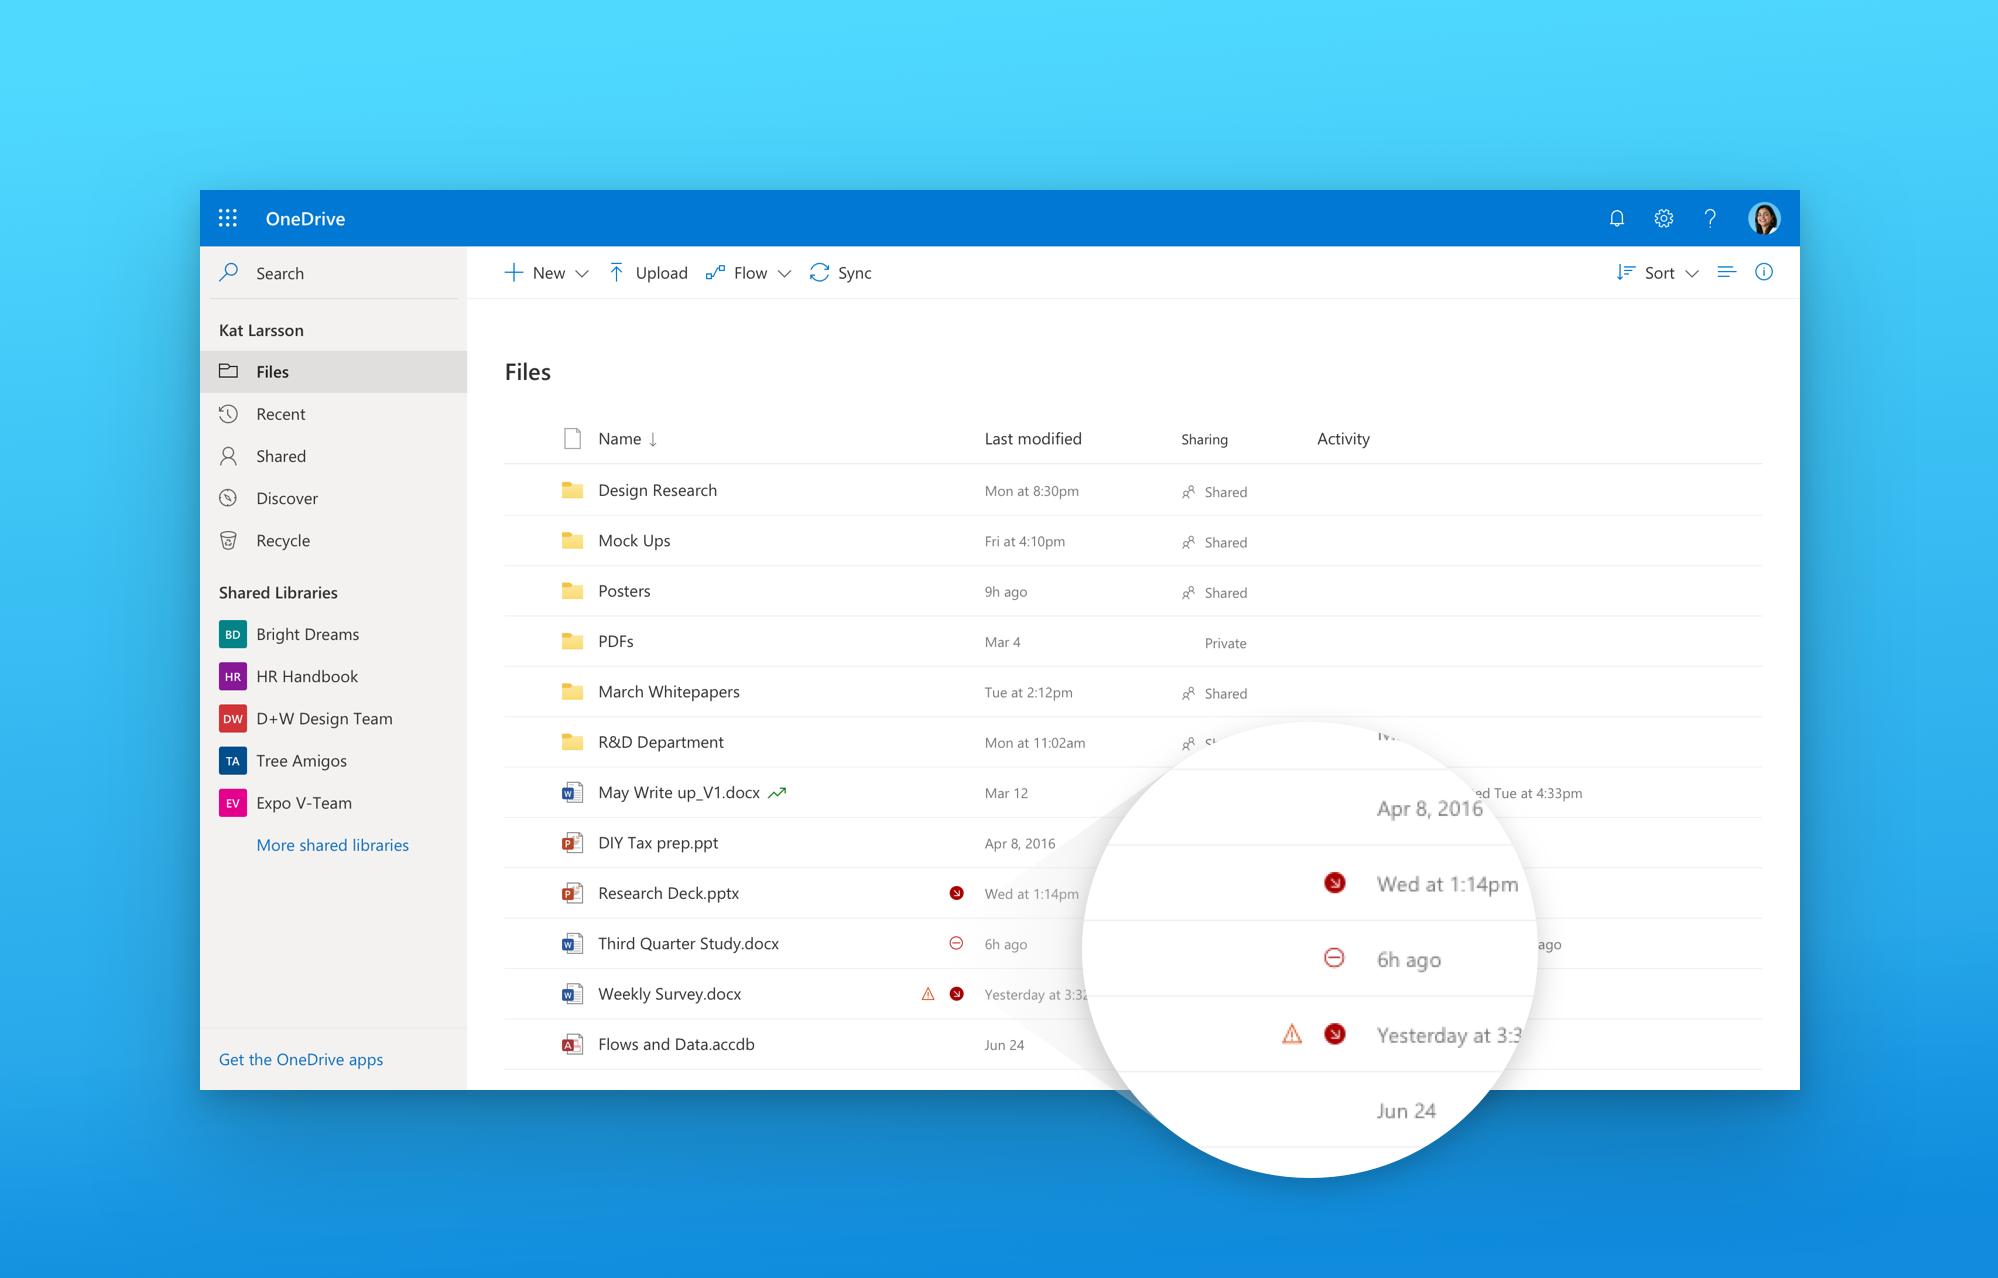 Designing A Fluent And Intelligent Onedrive Microsoft Tech Community 303748